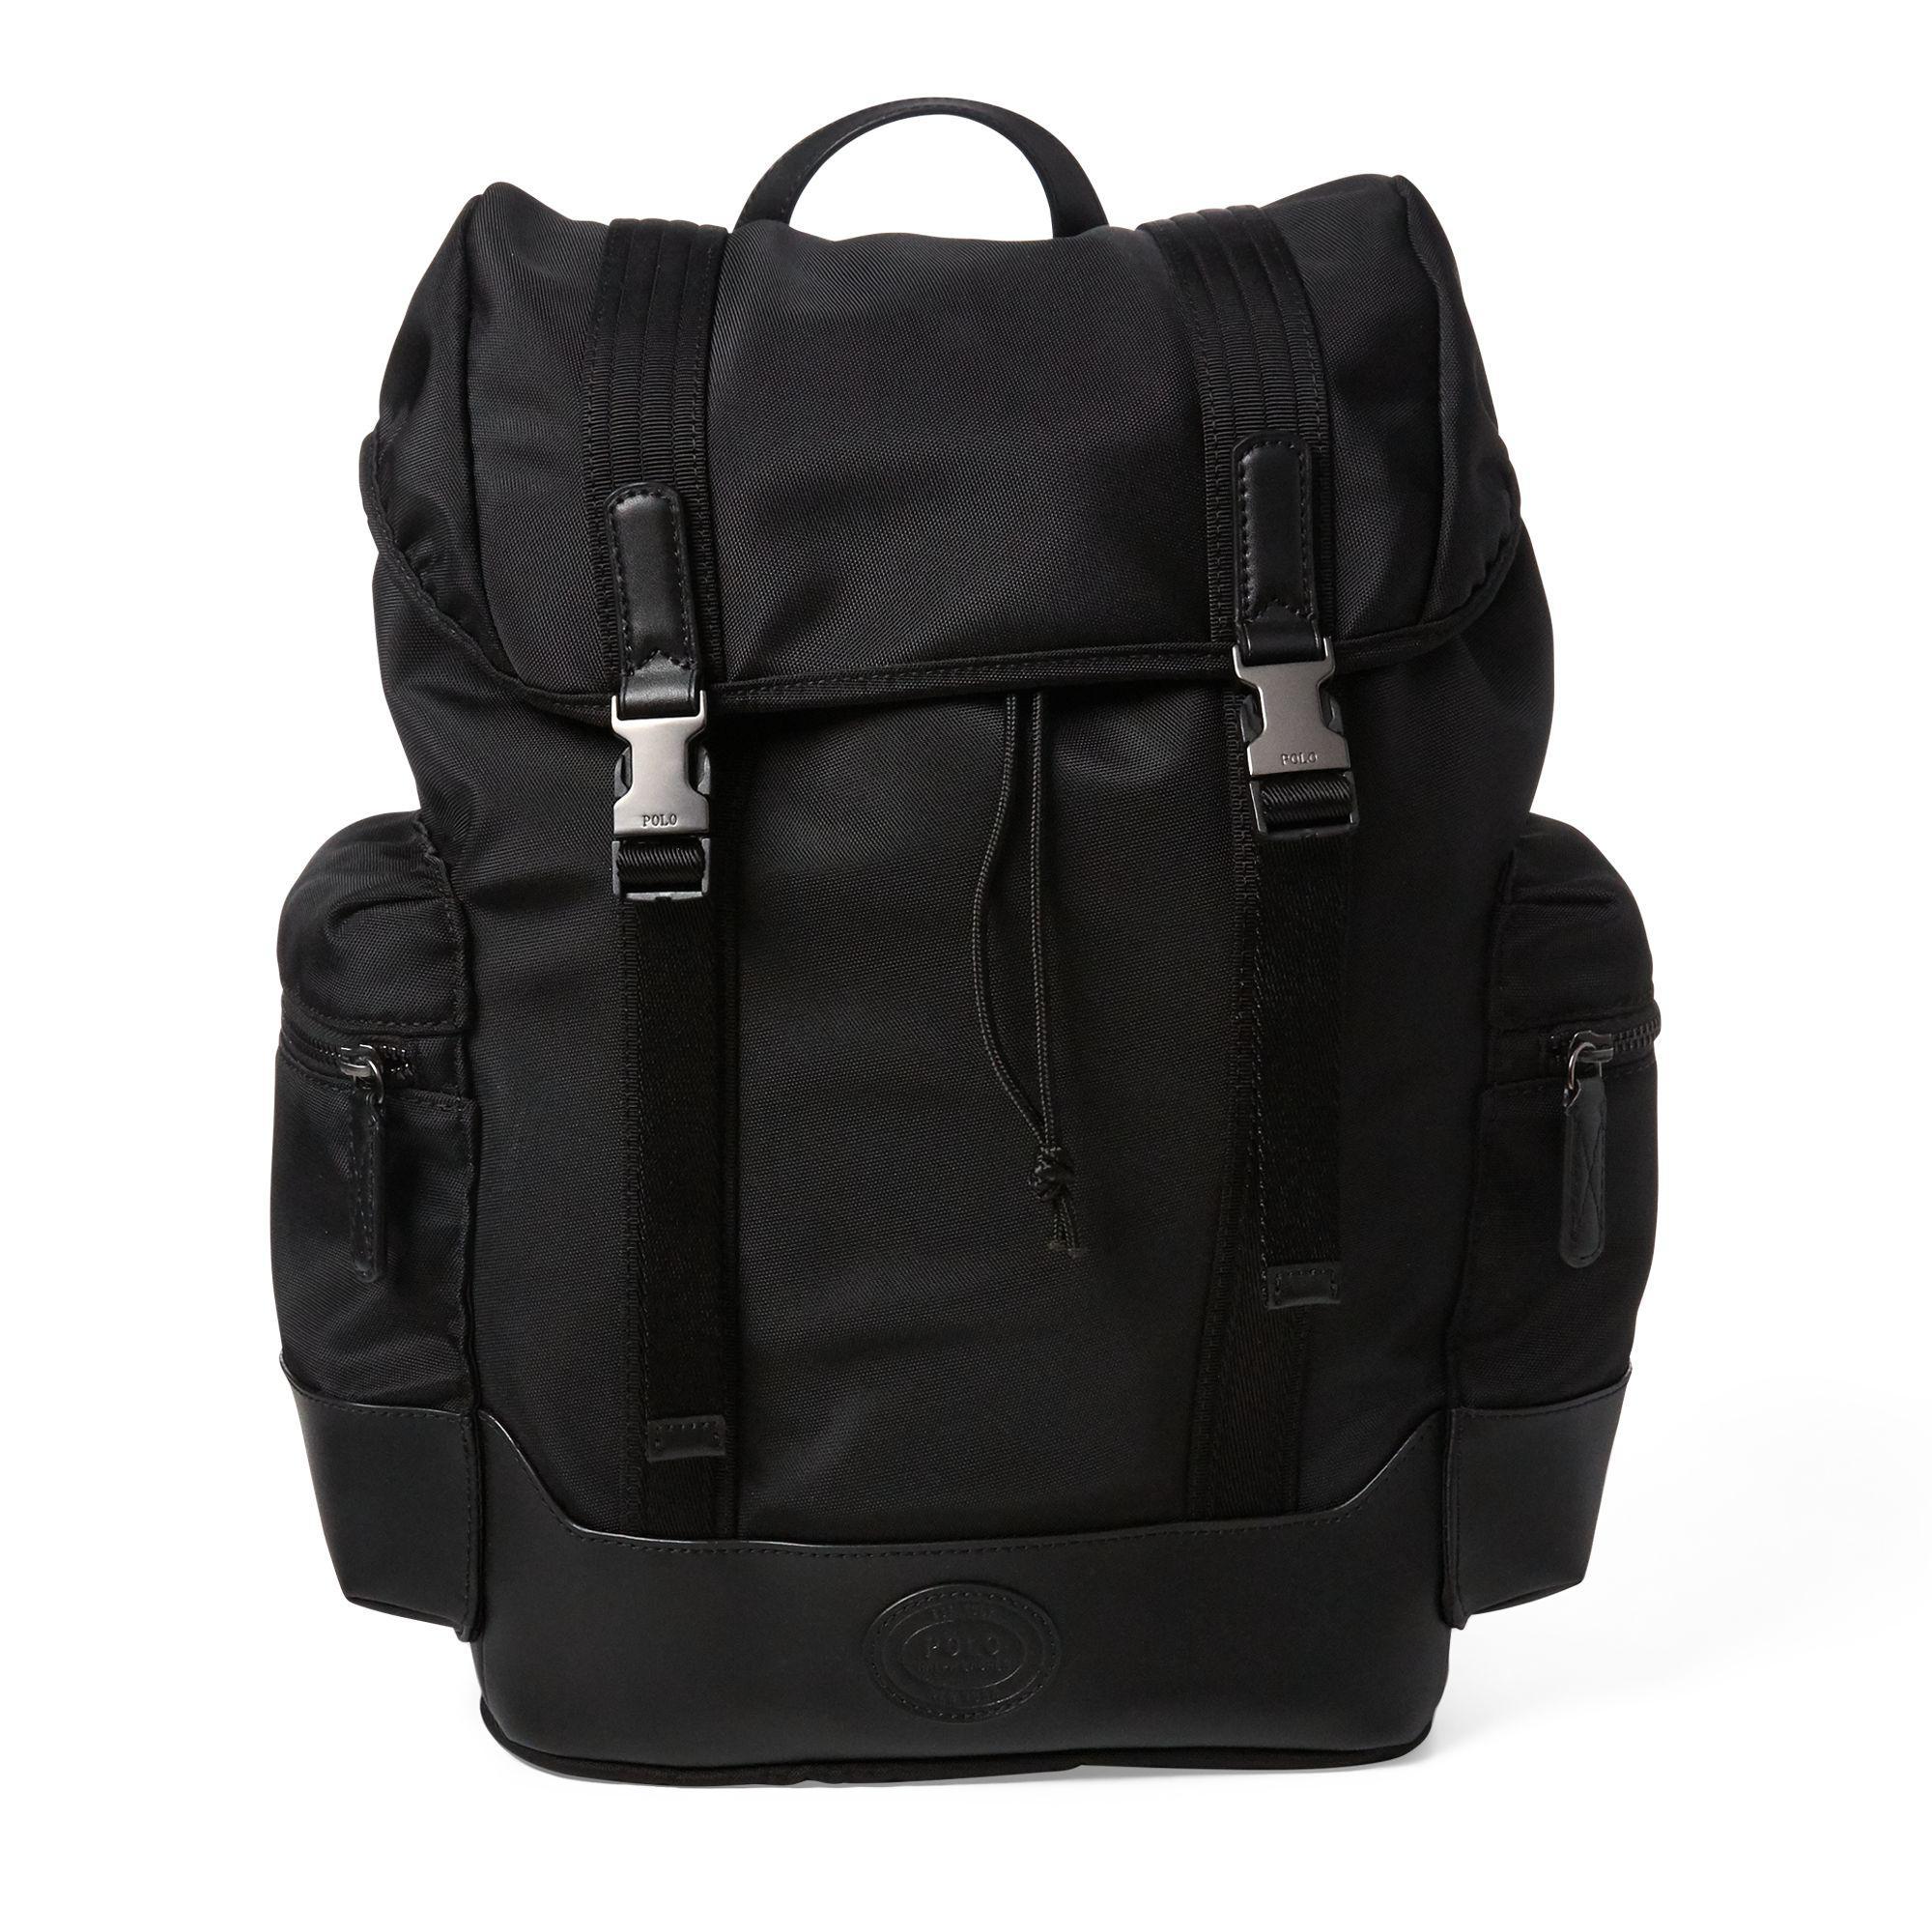 Polo Ralph Lauren Thompson Ii Backpack in Black for Men - Lyst ffe6c237916ae